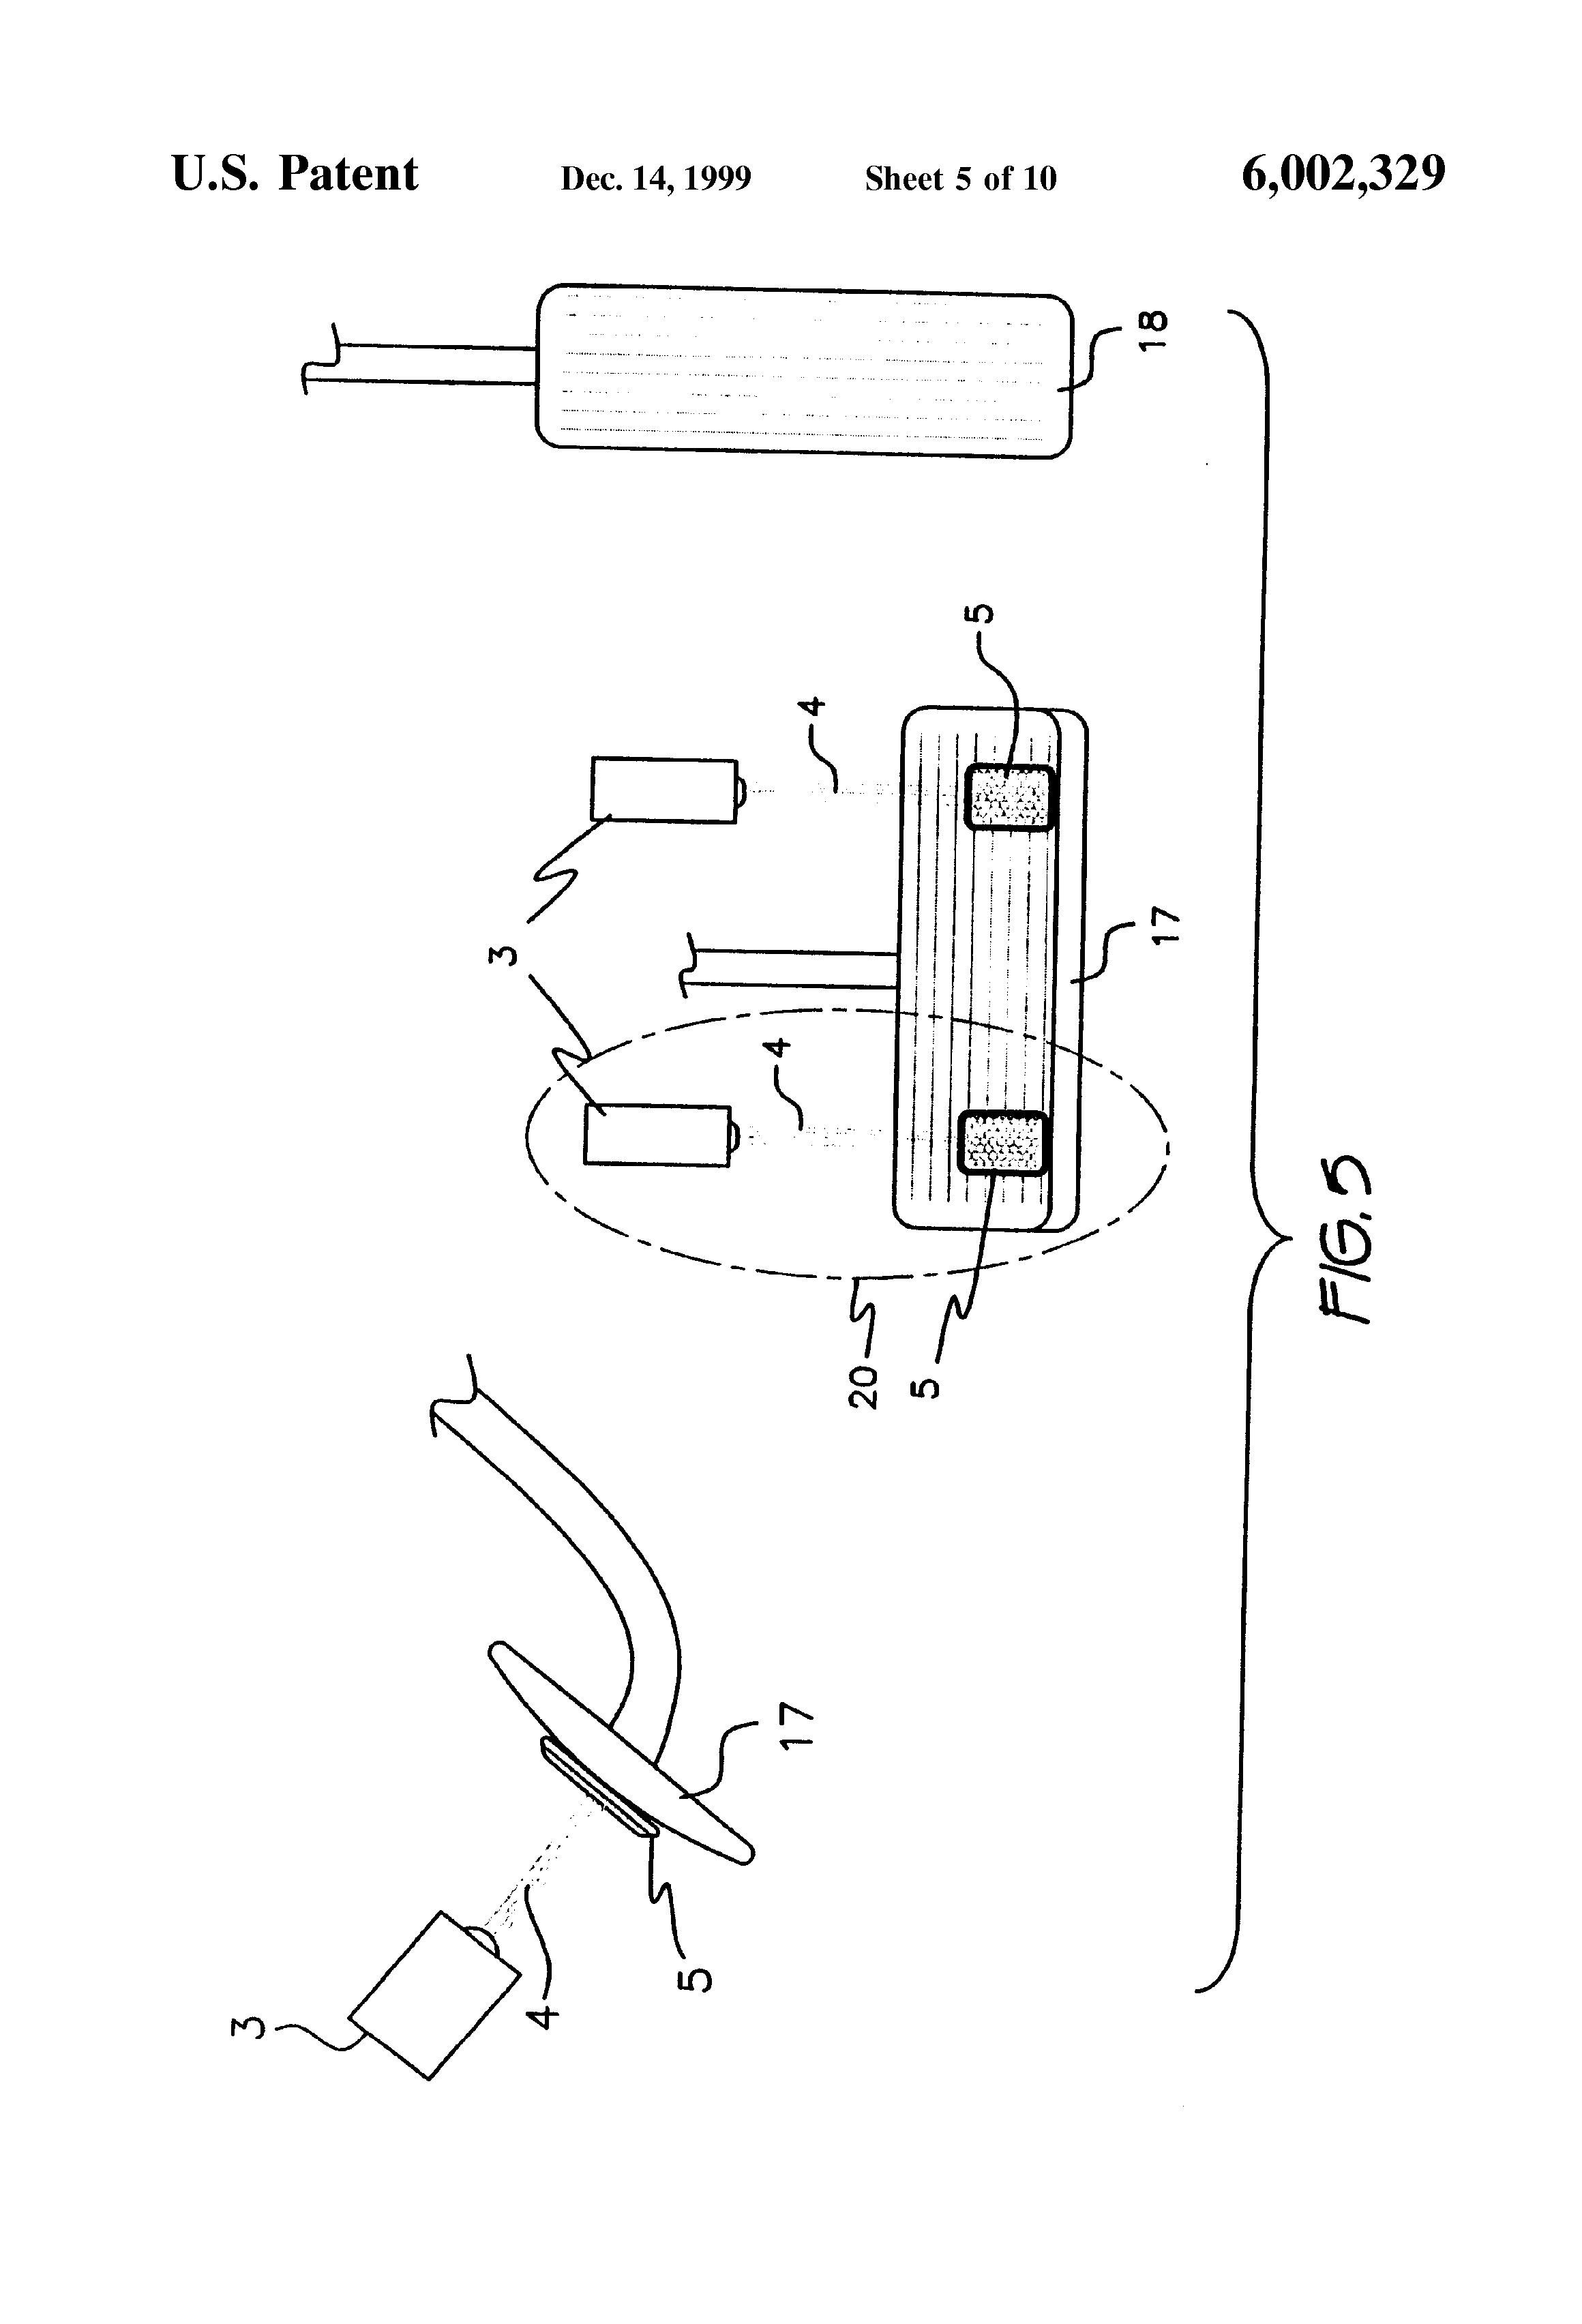 Patent US Early Warning Braking System Google Patents - Car signs on dashboardrobert jacek google